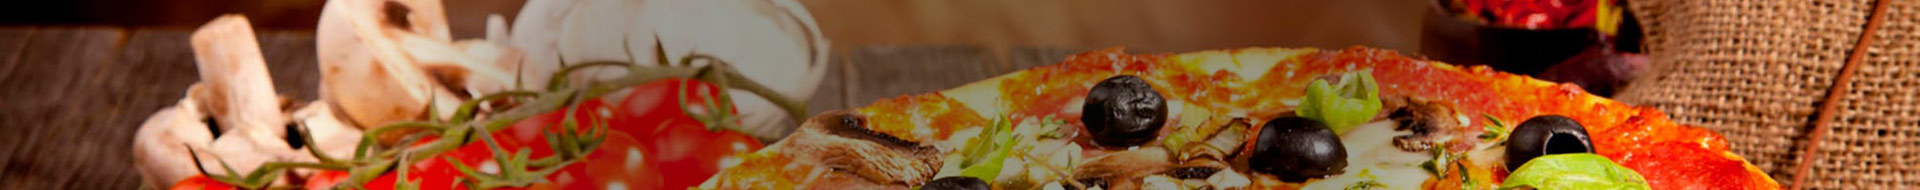 livraison pizza toulon bellagio pizza net. Black Bedroom Furniture Sets. Home Design Ideas